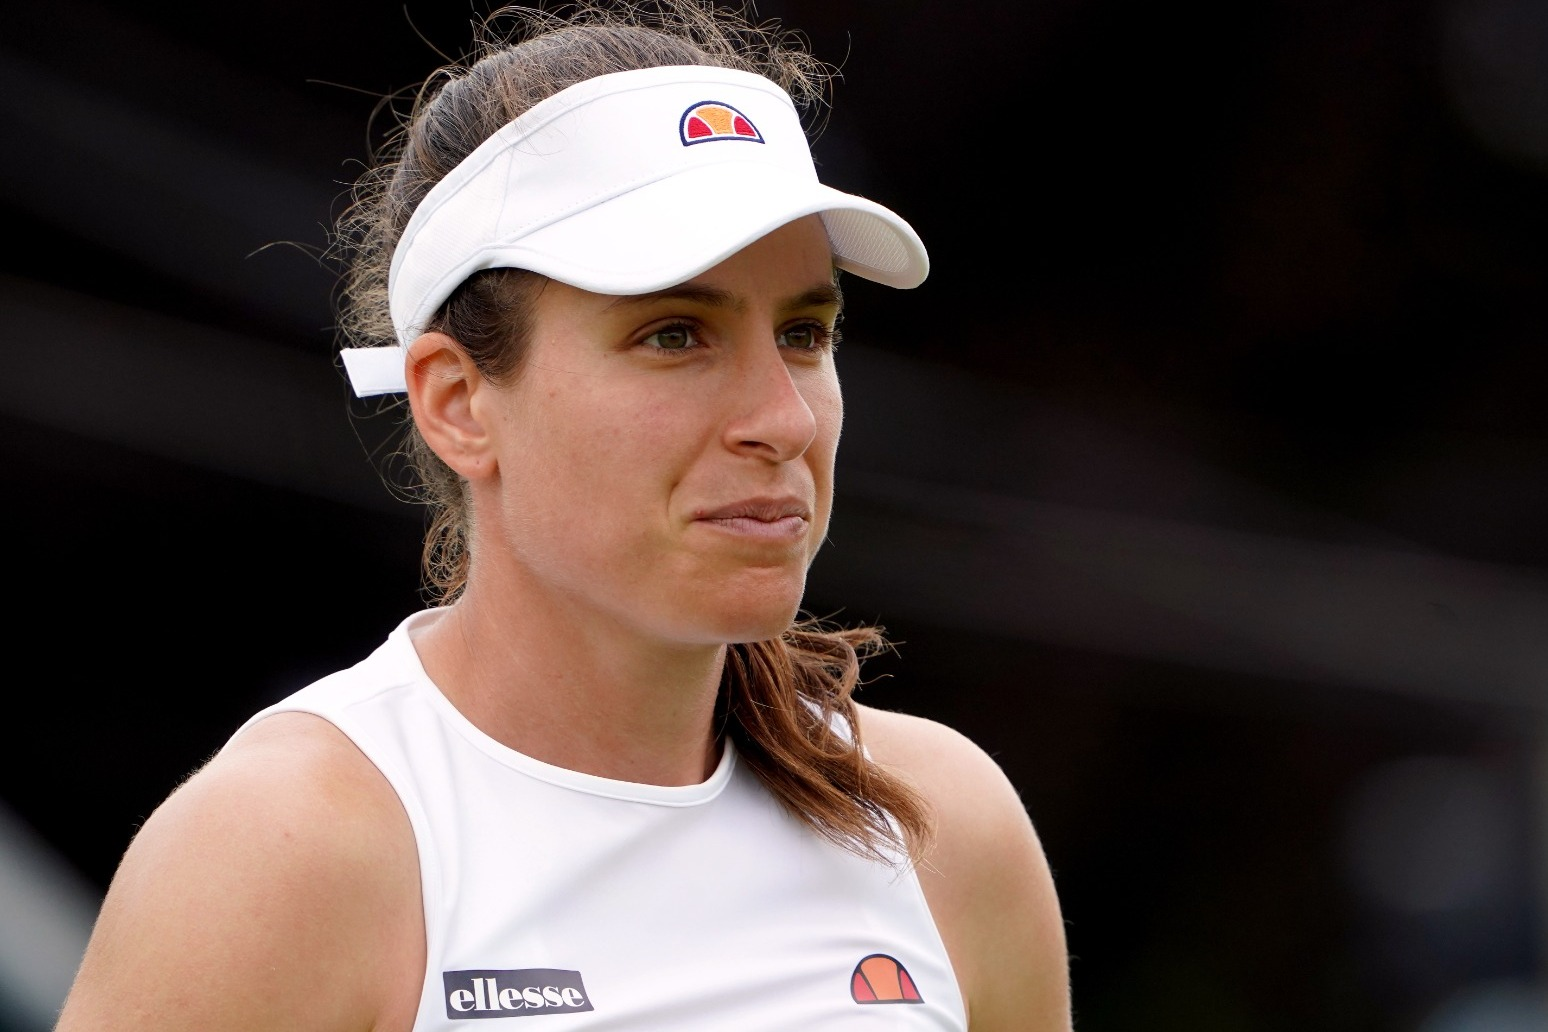 Johanna Konta forced to withdraw from Wimbledon due to coronavirus close contact